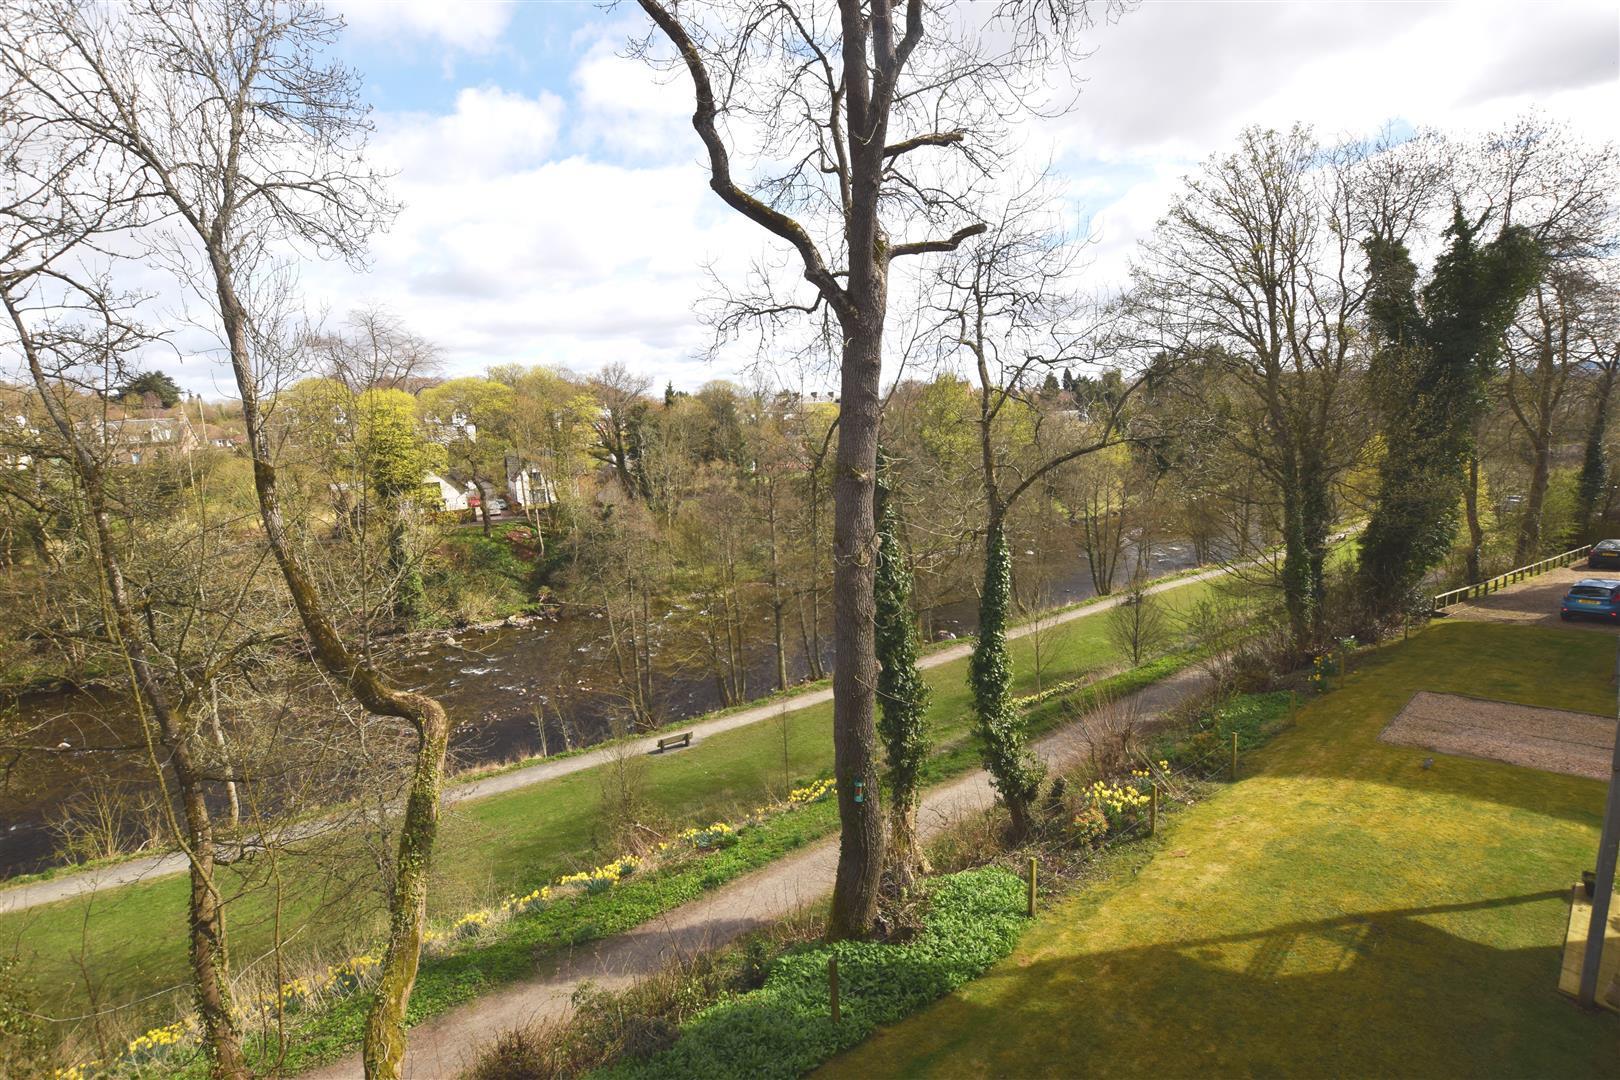 40, Riverside Park, Blairgowrie, Perthshire, PH10 6GB, UK